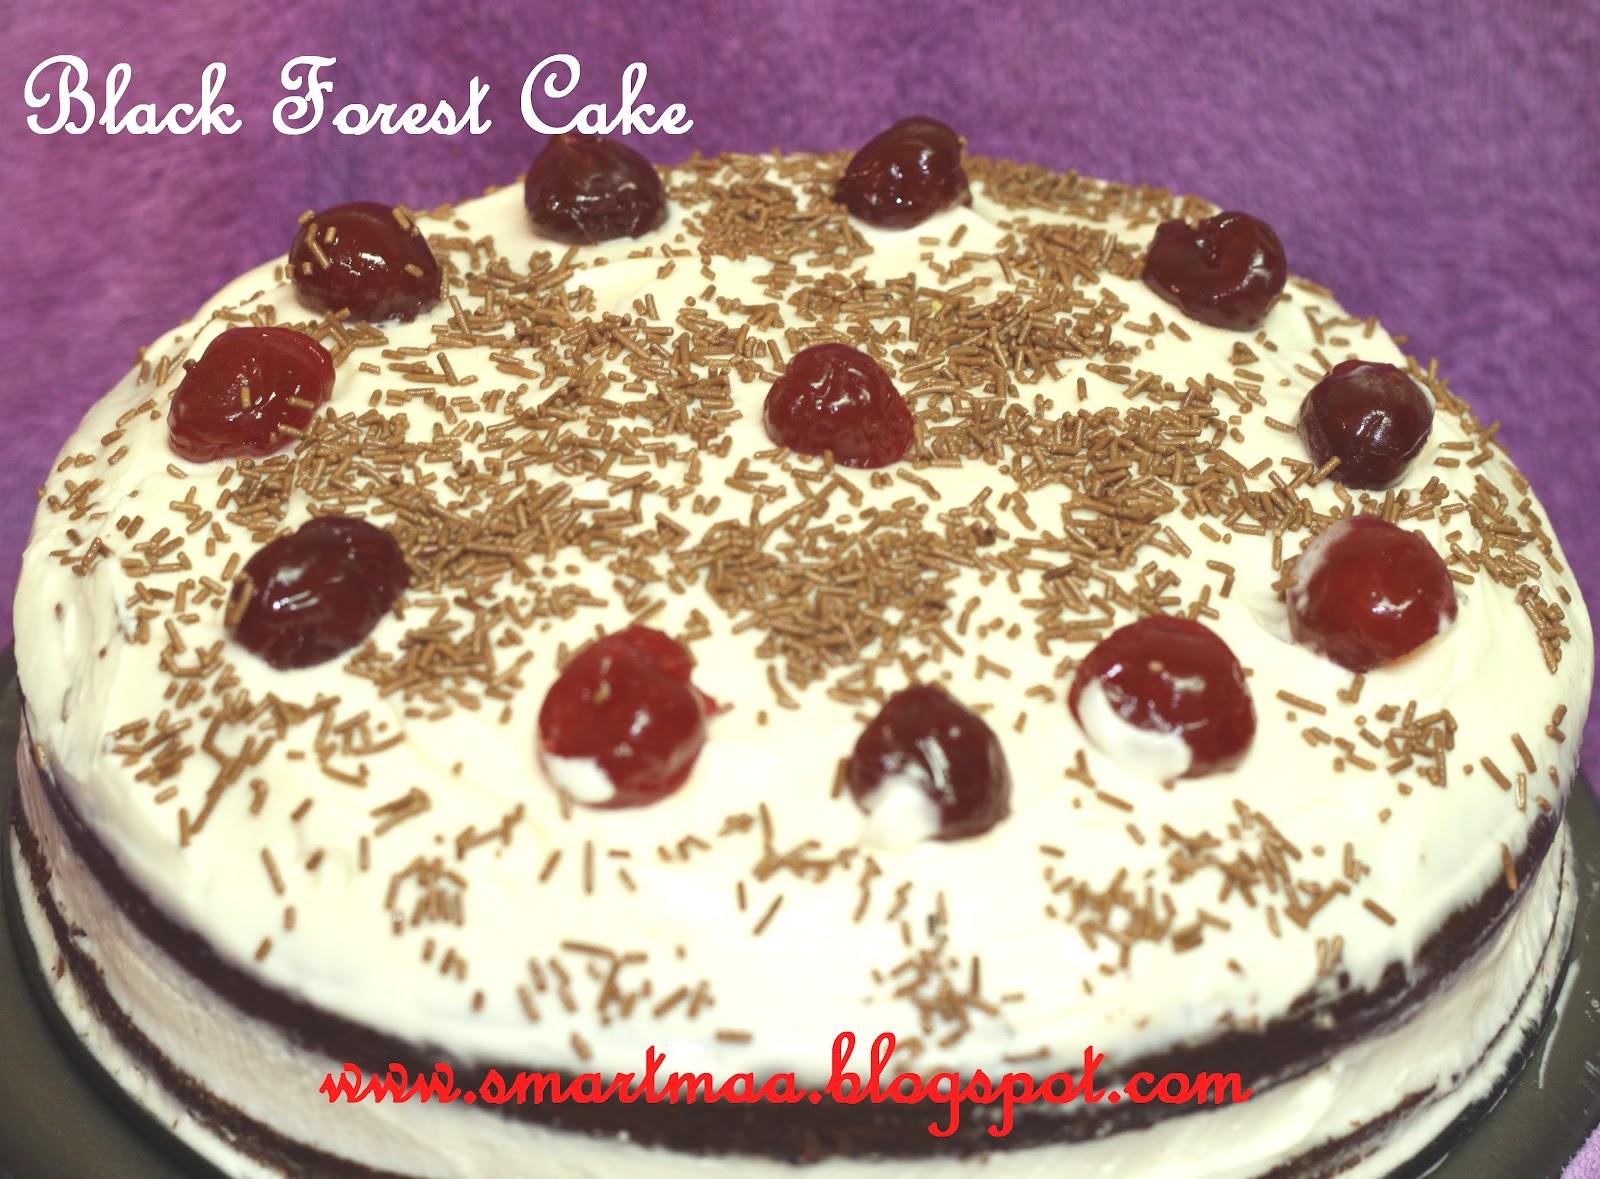 Smart Maa: Black Forest Cake